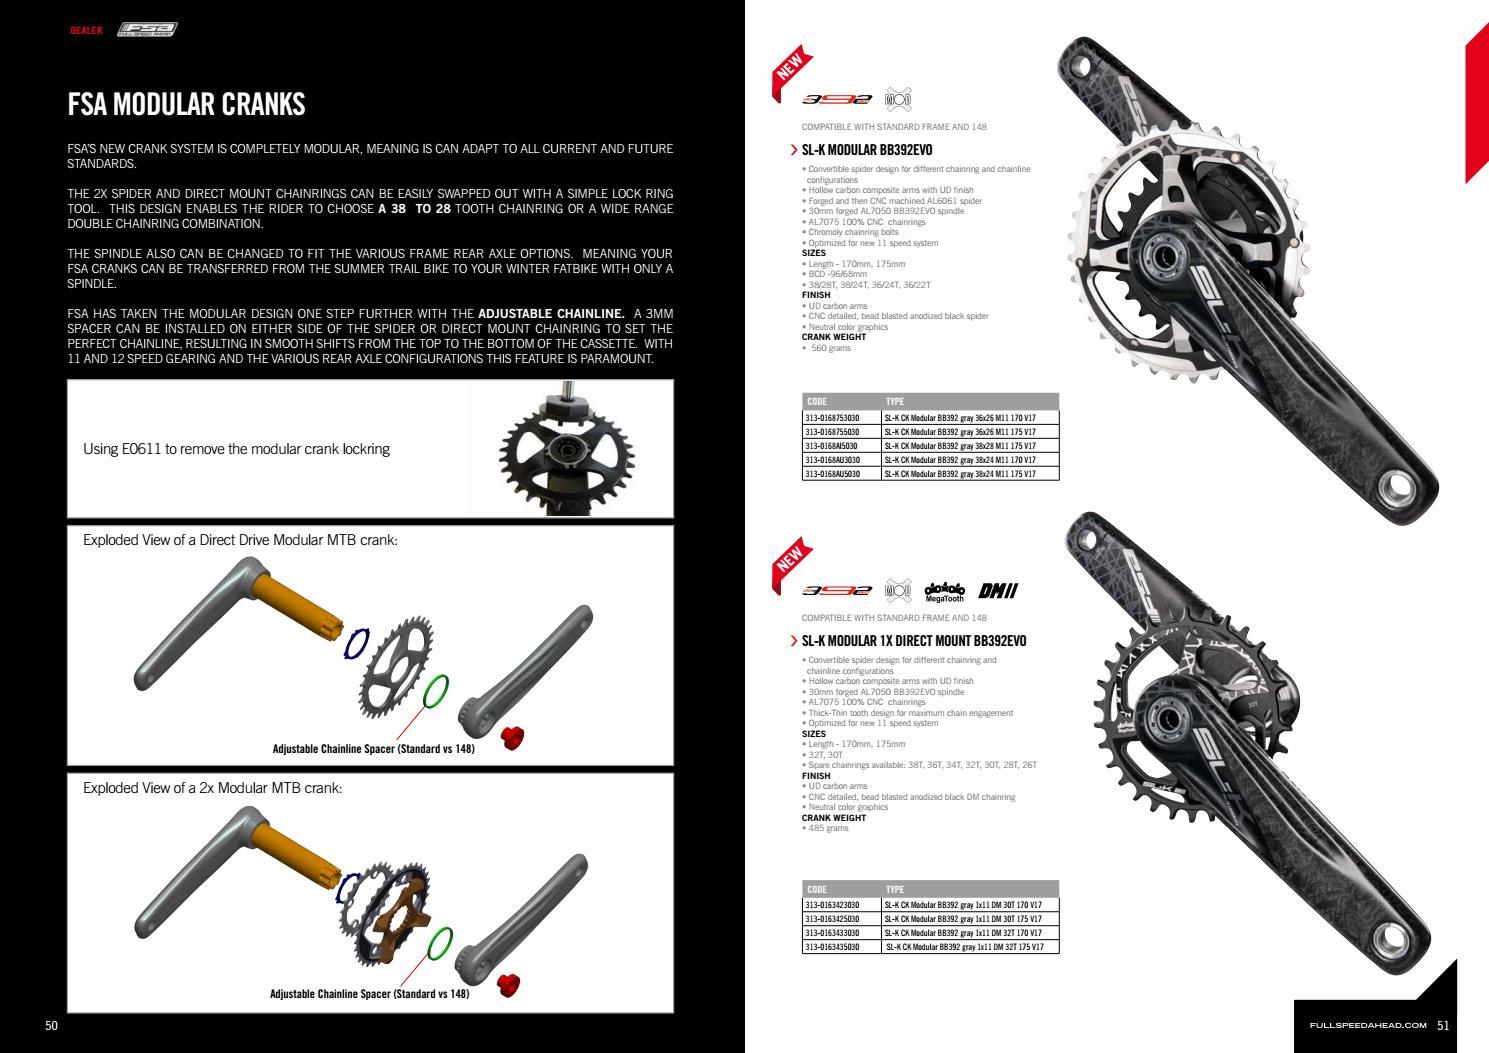 2017 Dealer Catalog – FSA, VISION, METROPOLIS by FSA - Full Speed ...